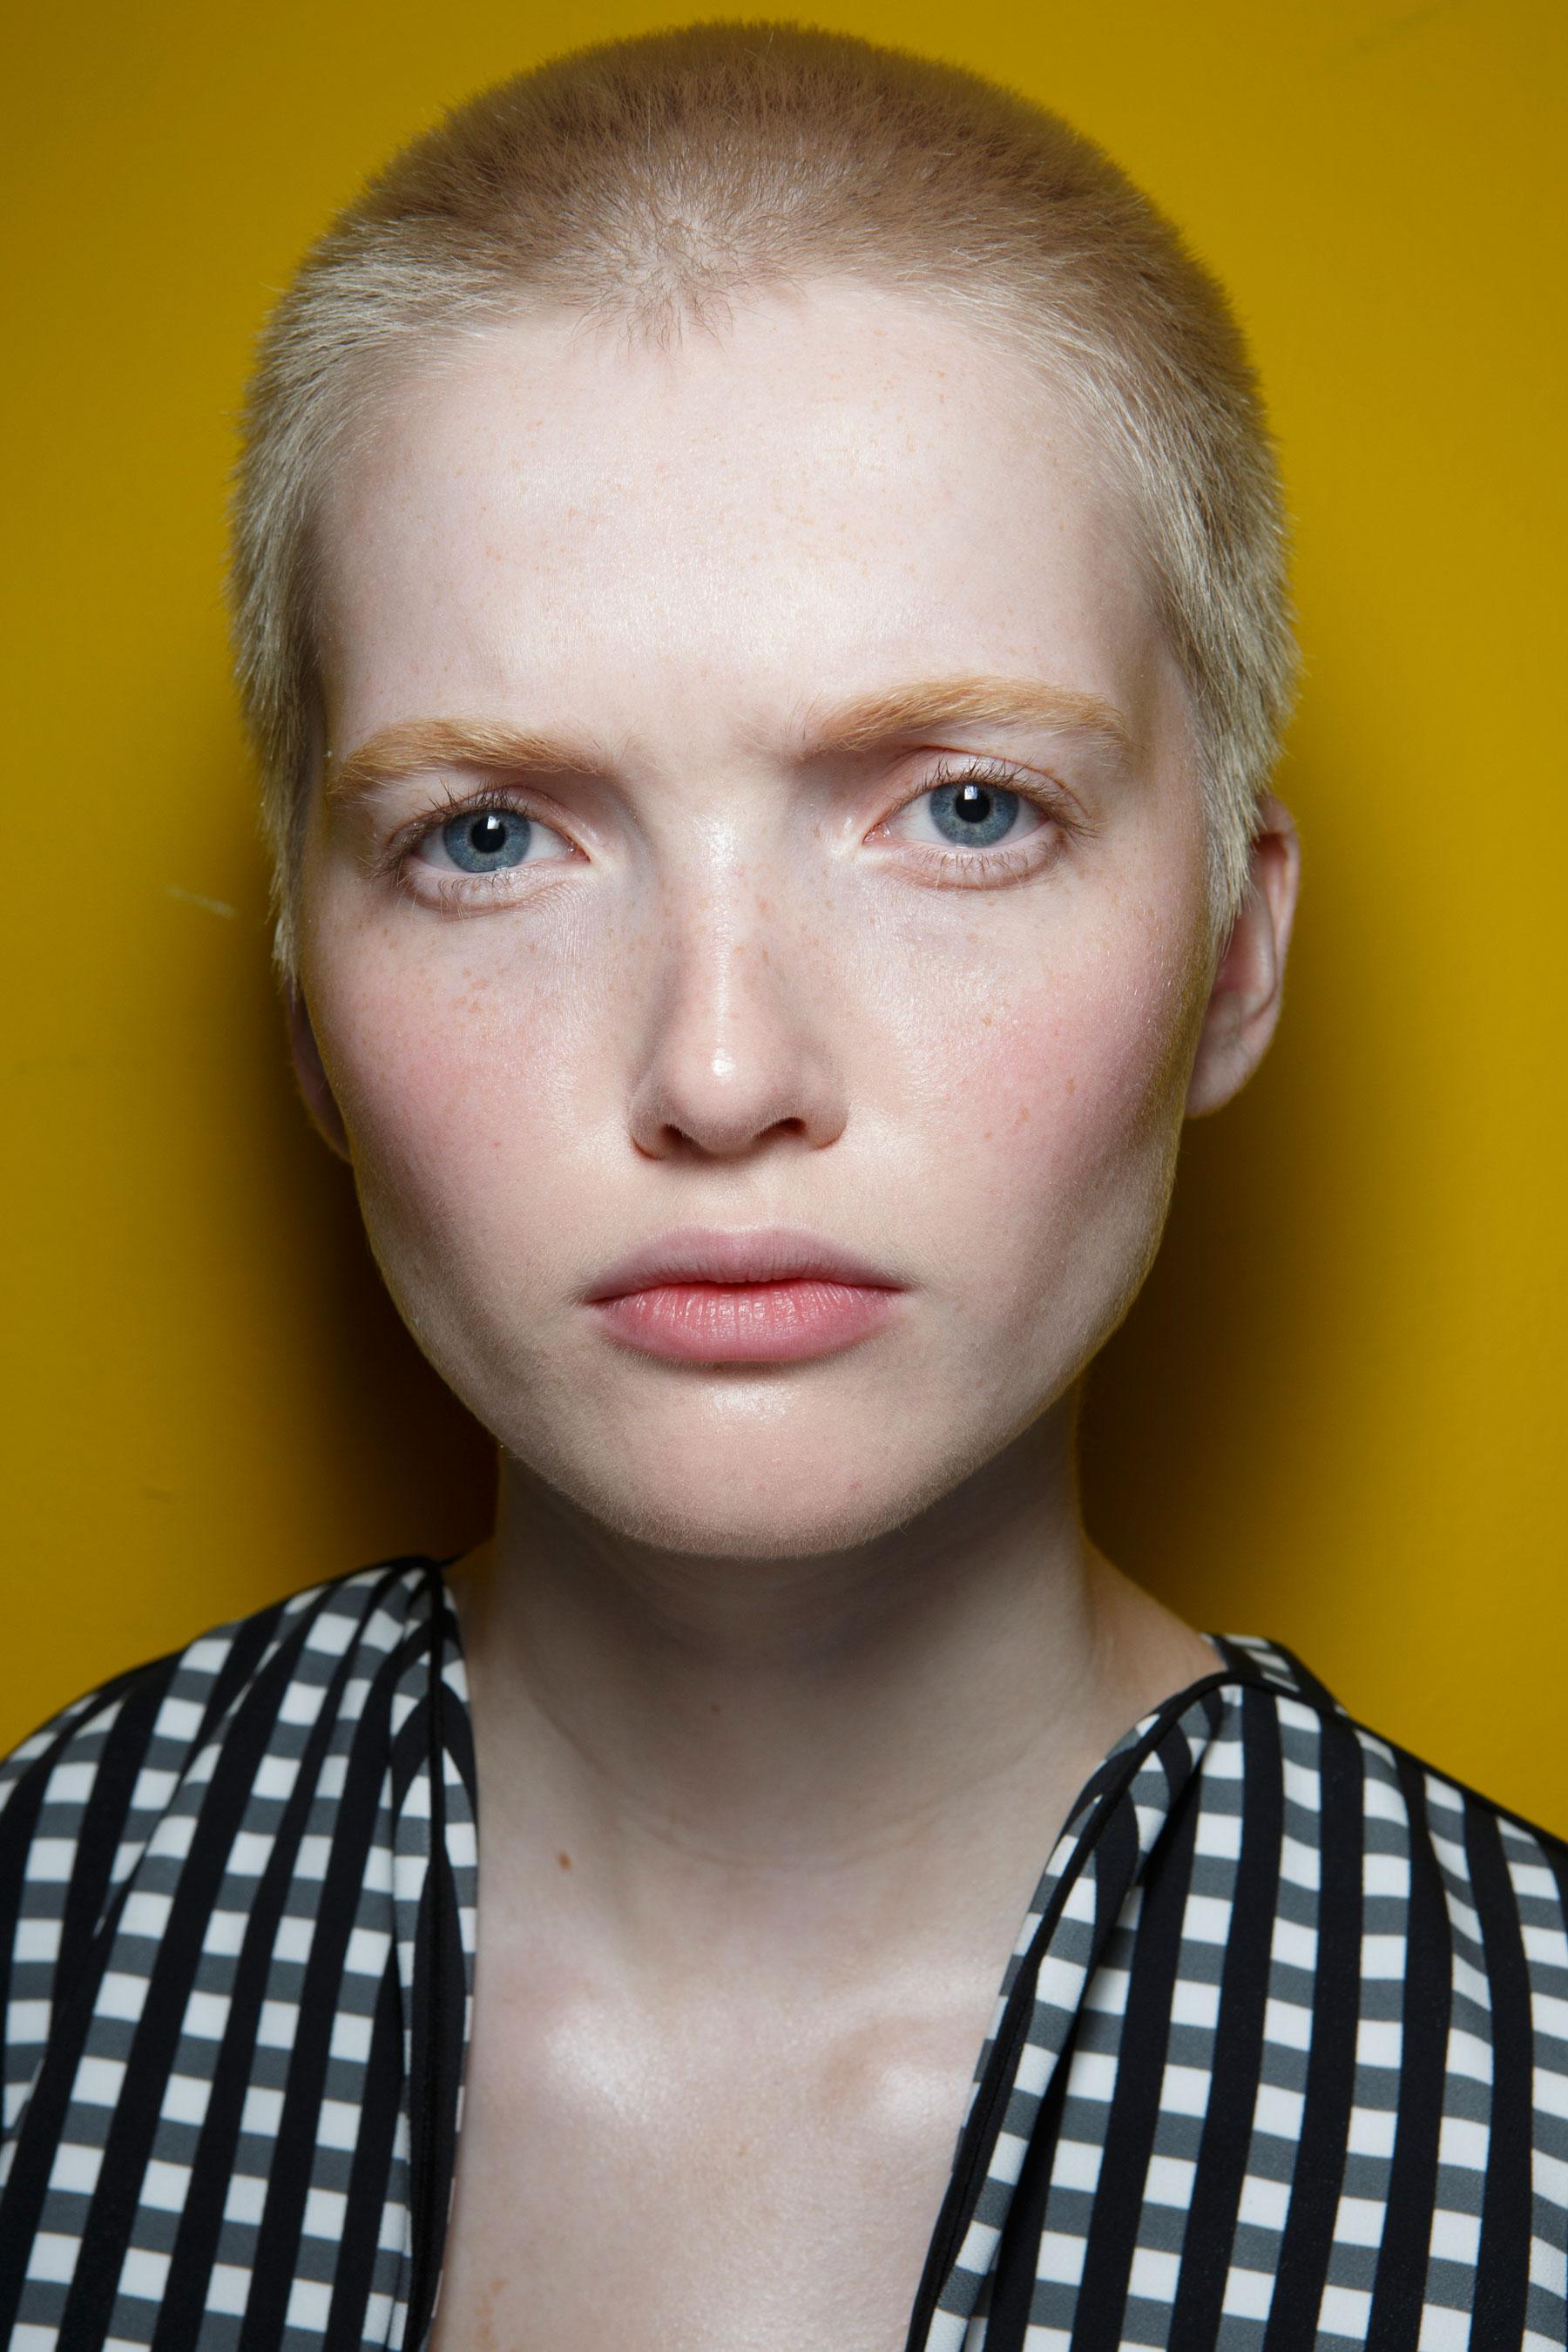 Preen-by-Thornton-Bregazzi-beauty-spring-2016-fashion-show-the-impression-035